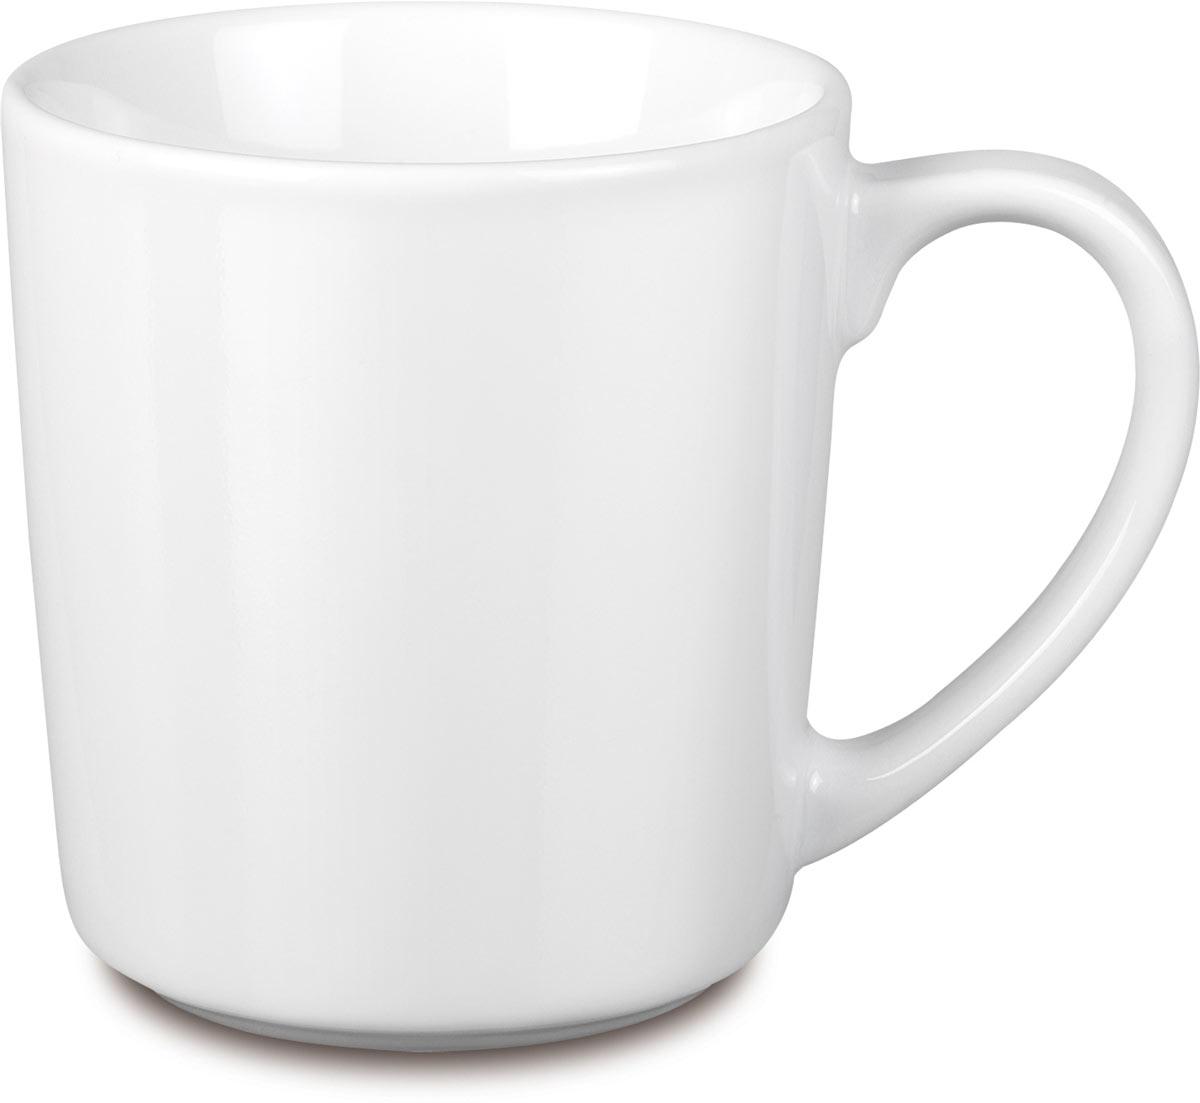 mug personnalise bas prix mug pas cher mugs publicitaires objets publicitaires objet. Black Bedroom Furniture Sets. Home Design Ideas